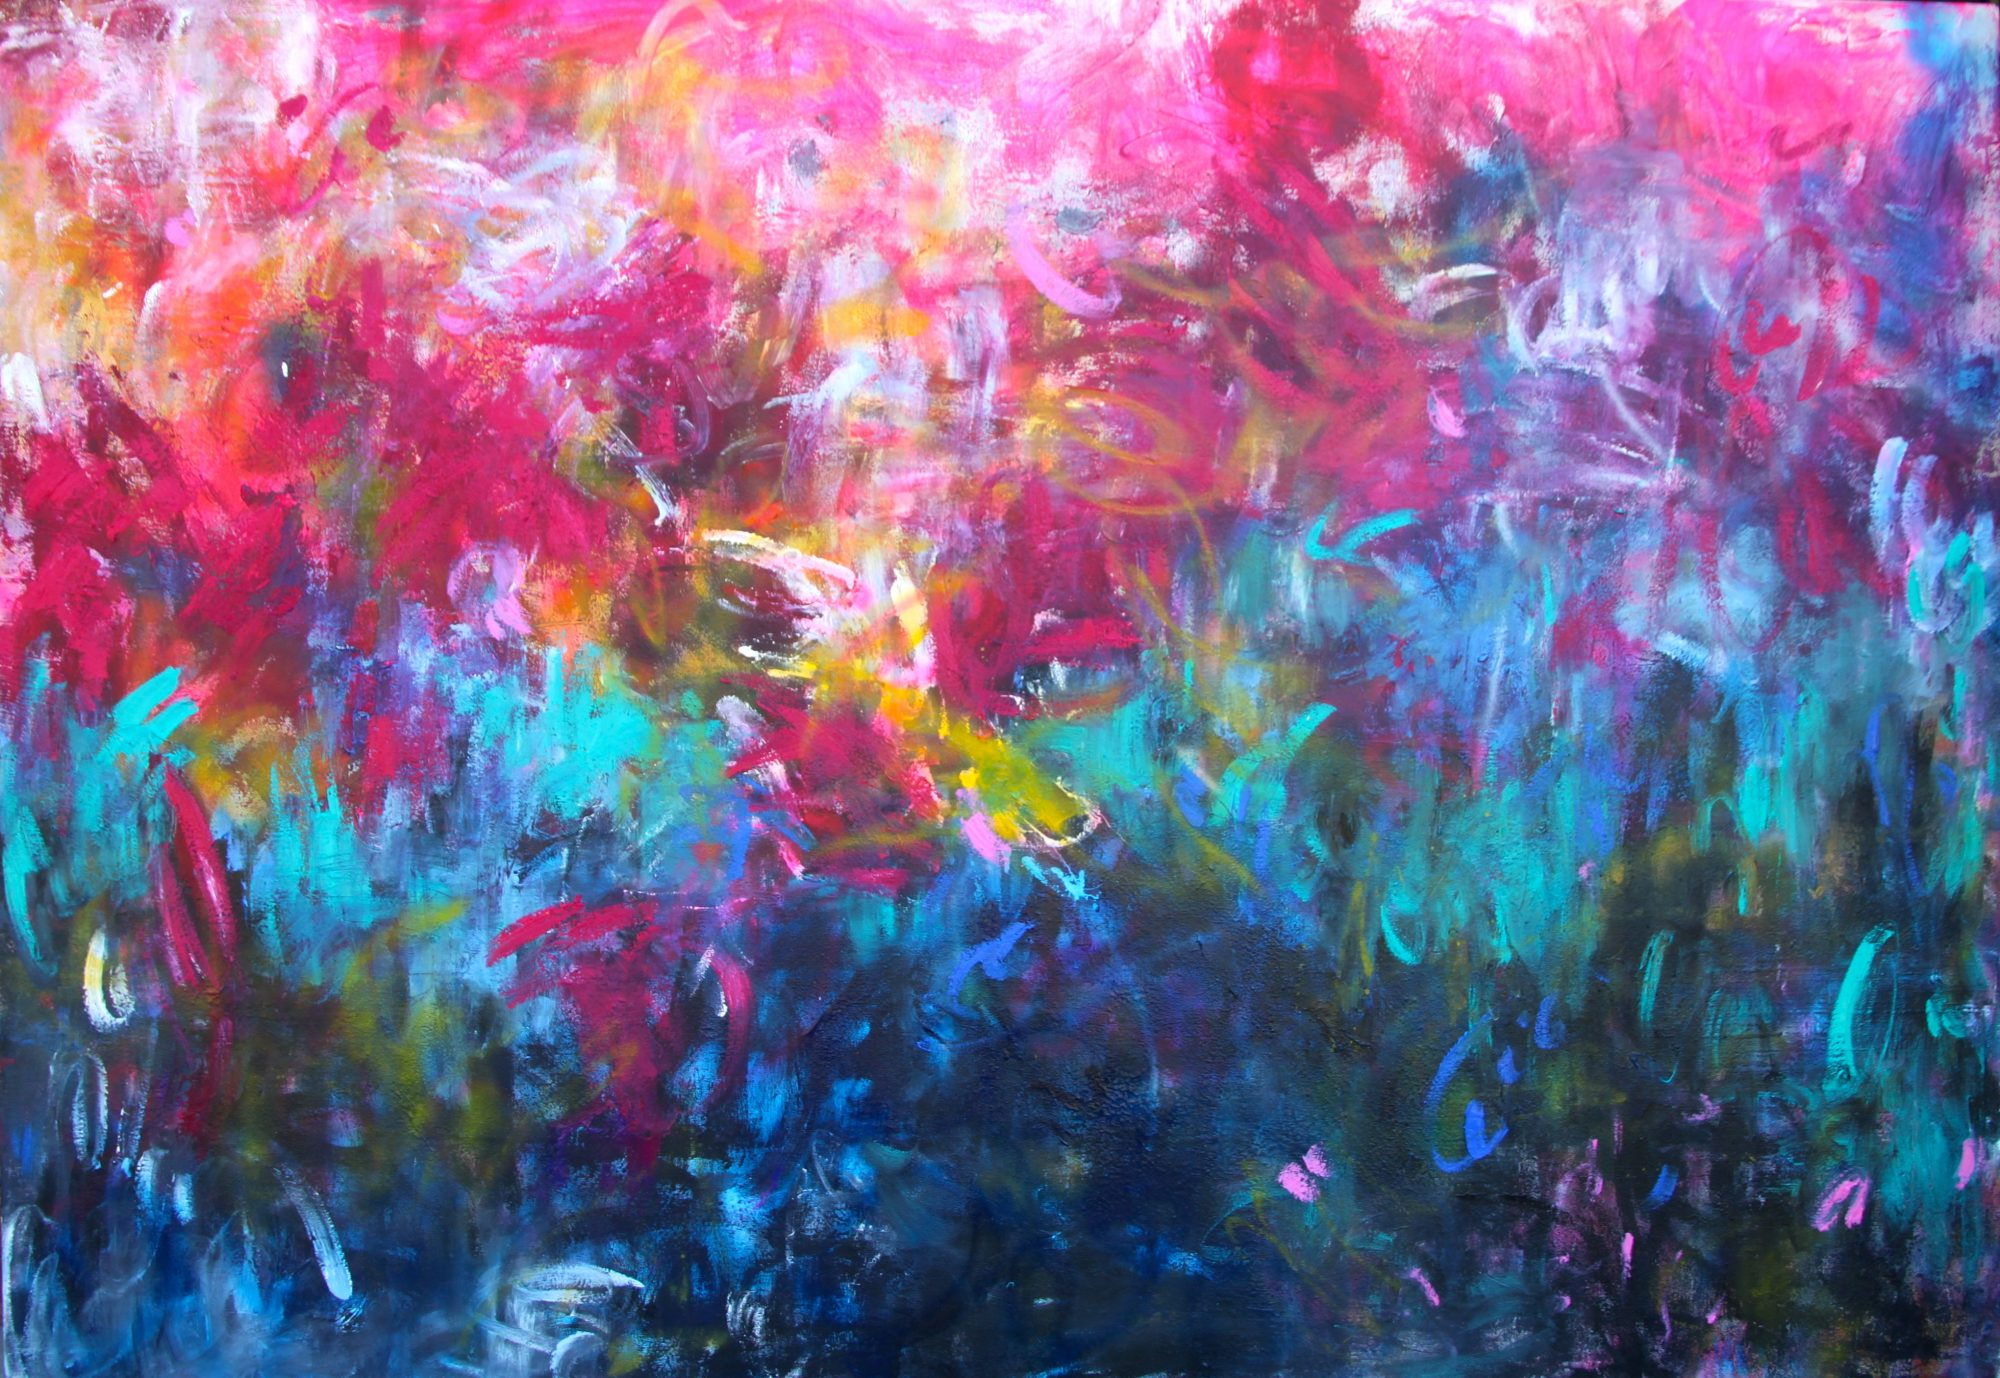 belinda-nadwie-art-abstract-art-painting-eternally yours